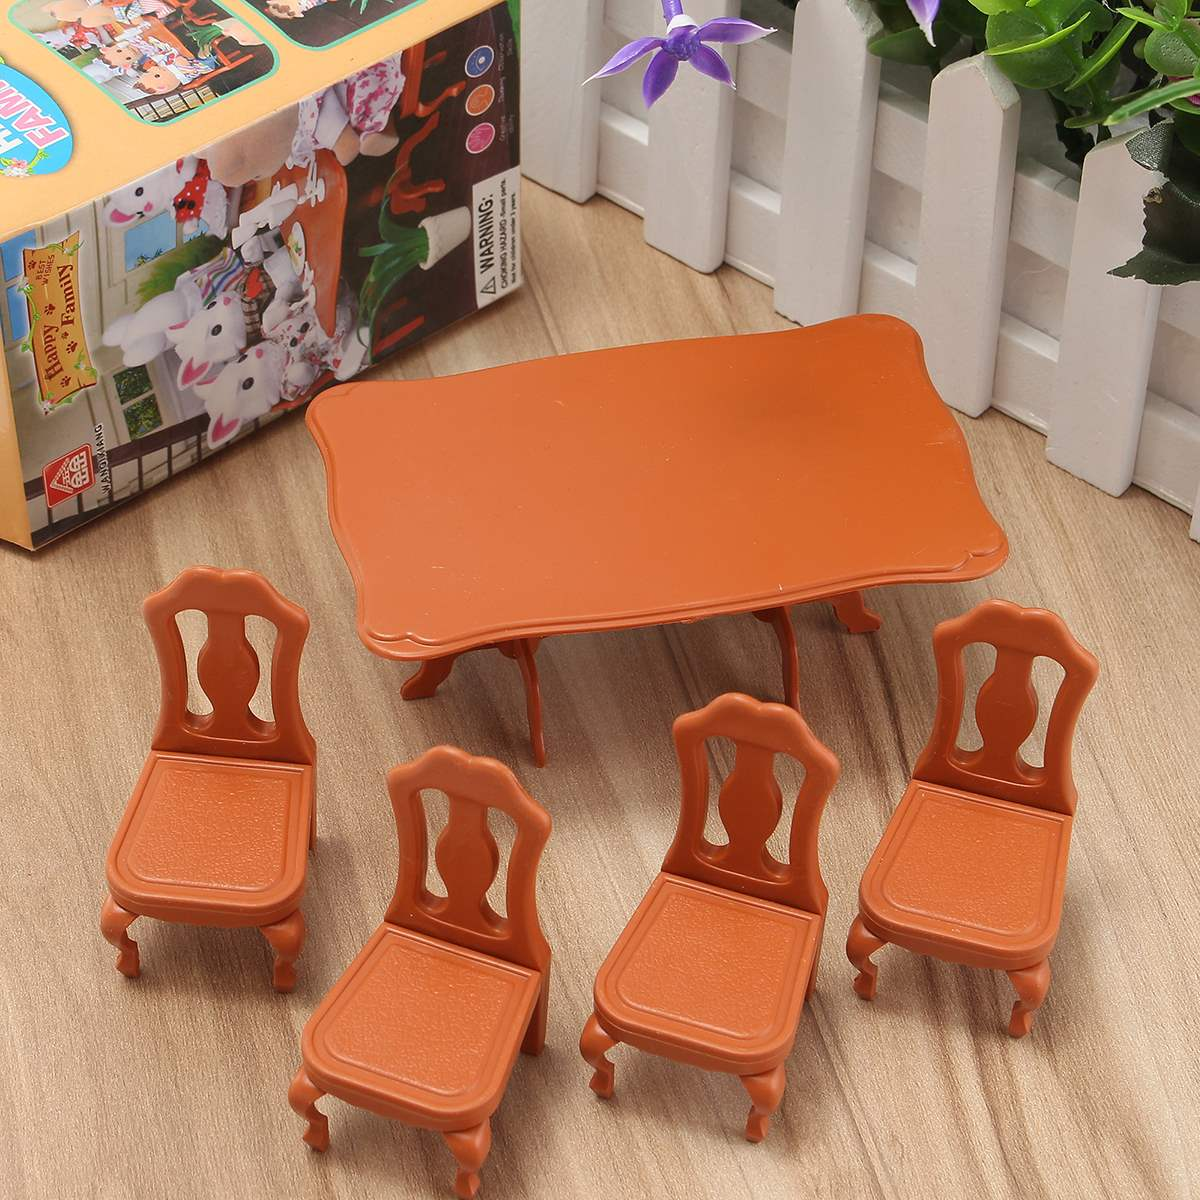 DIY Lovely Mini Furniture Dolls House Miniature Dining Table Chair Set  Children Kids Gift Toys Dolls